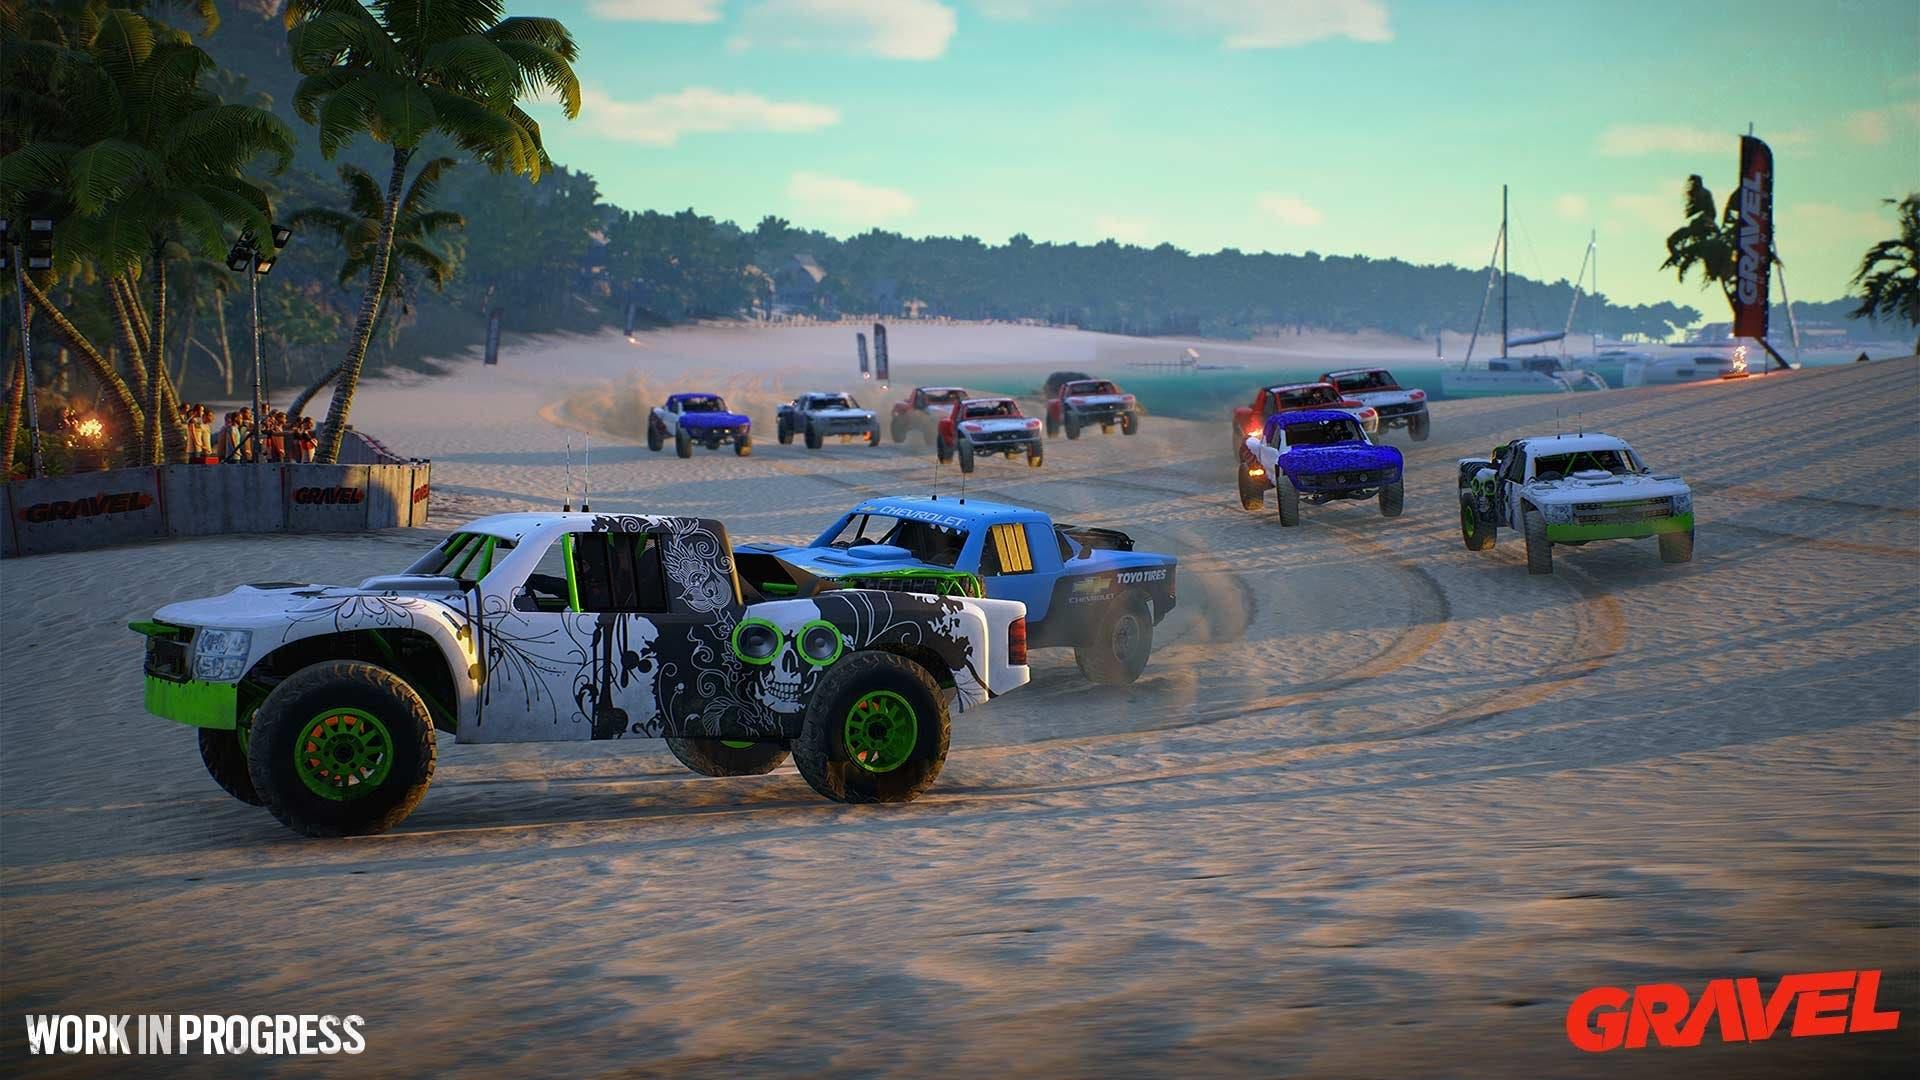 Análisis de Gravel - Xbox One 3